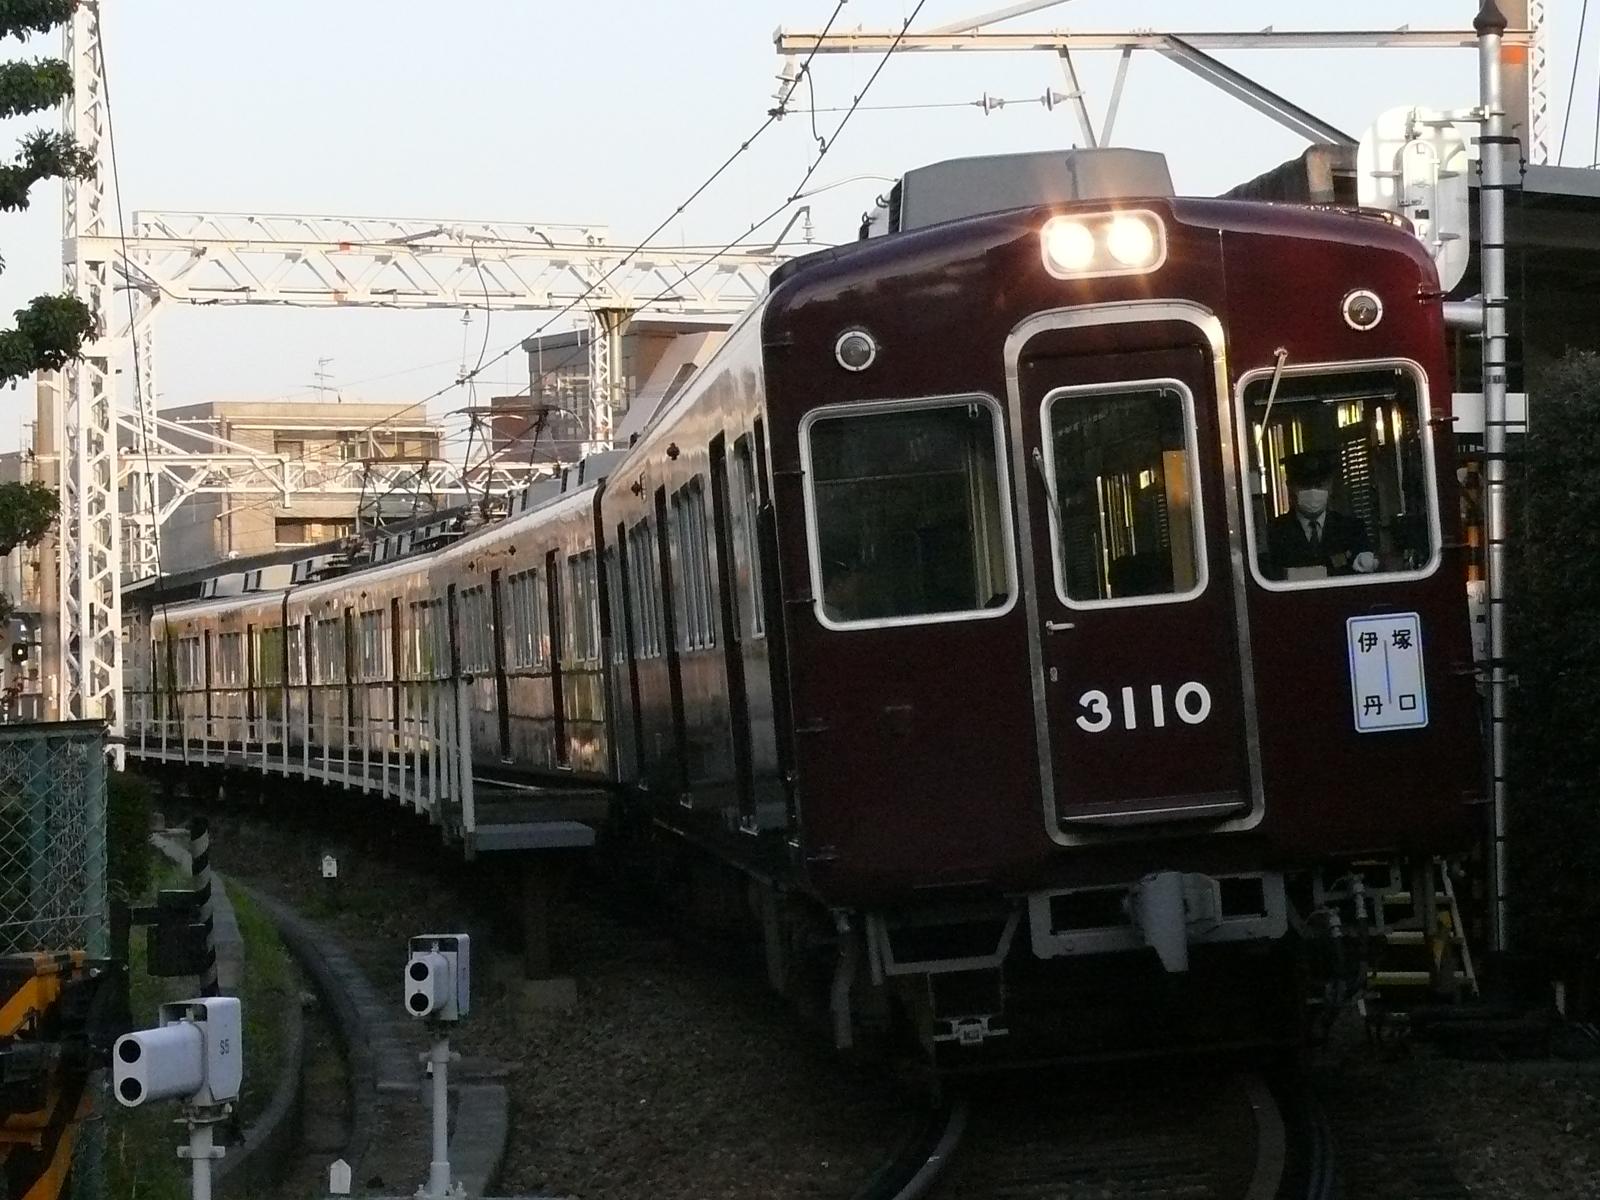 P1840330.jpg